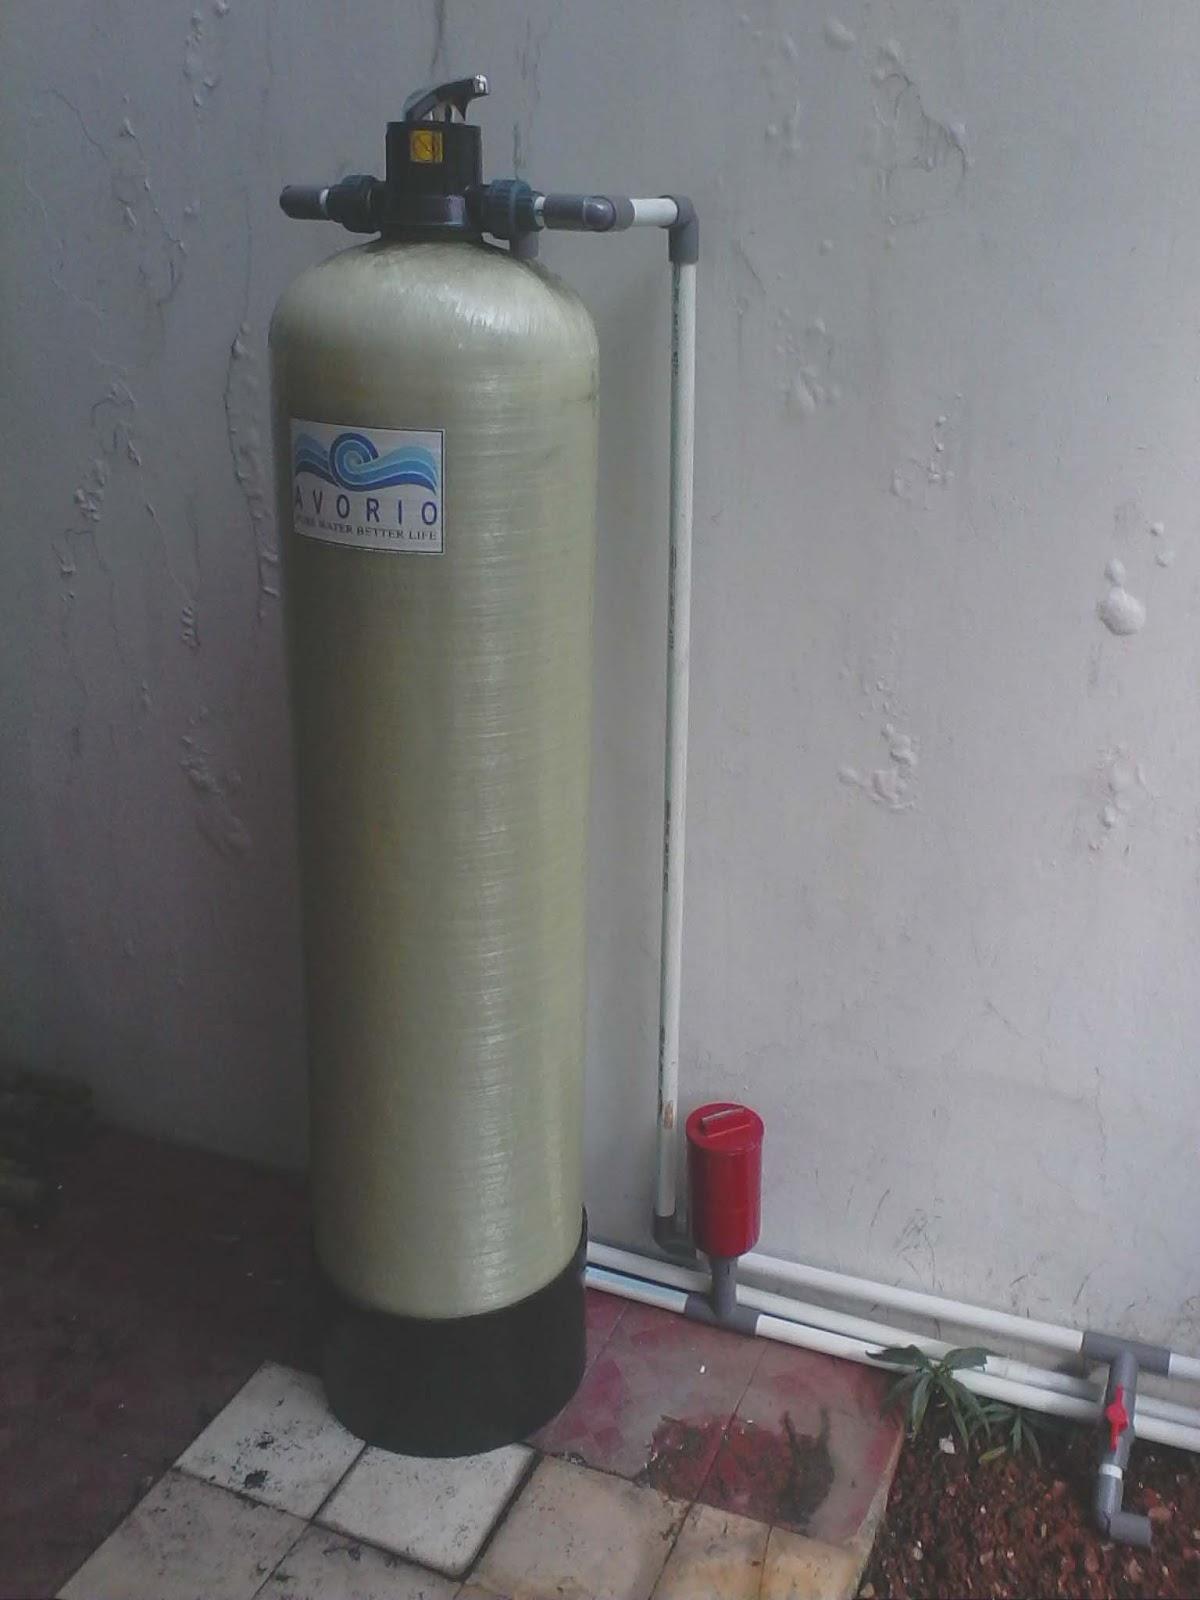 filter air sertifikat halal, harga murah untuk air tanah sumur bor, bandung, jakarta, depok, tangerang, bekasi, bogor